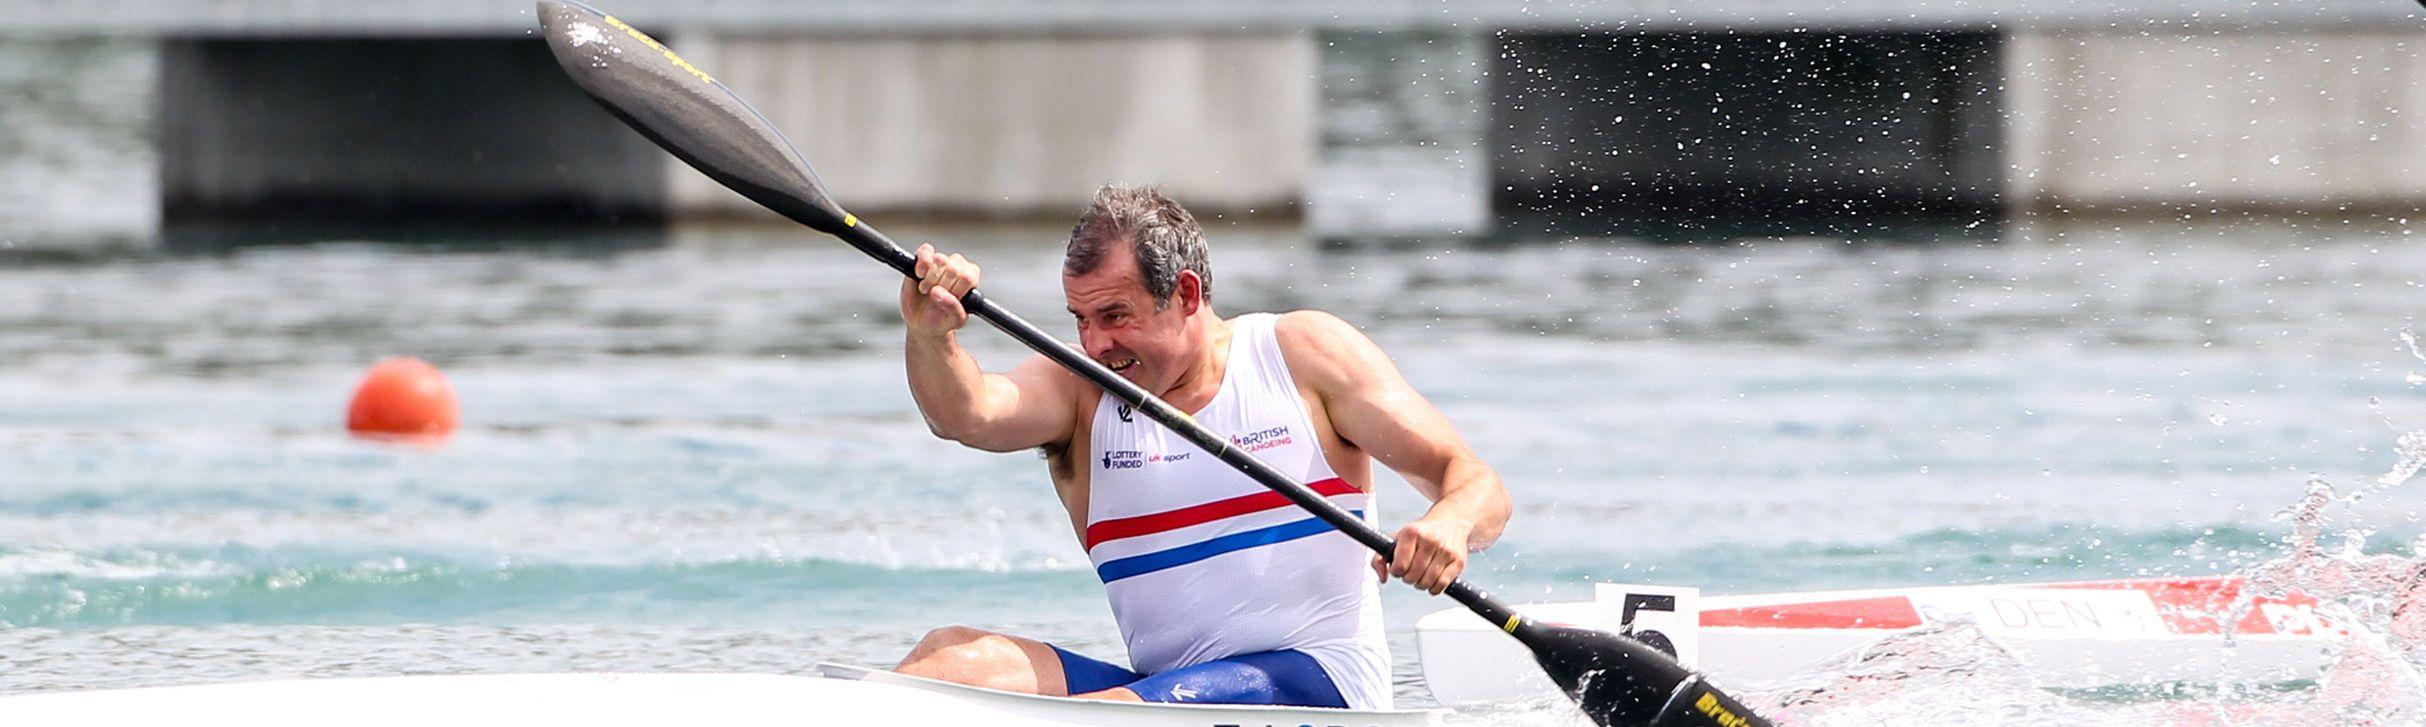 Tim Lodge GB Paralympic Canoeist